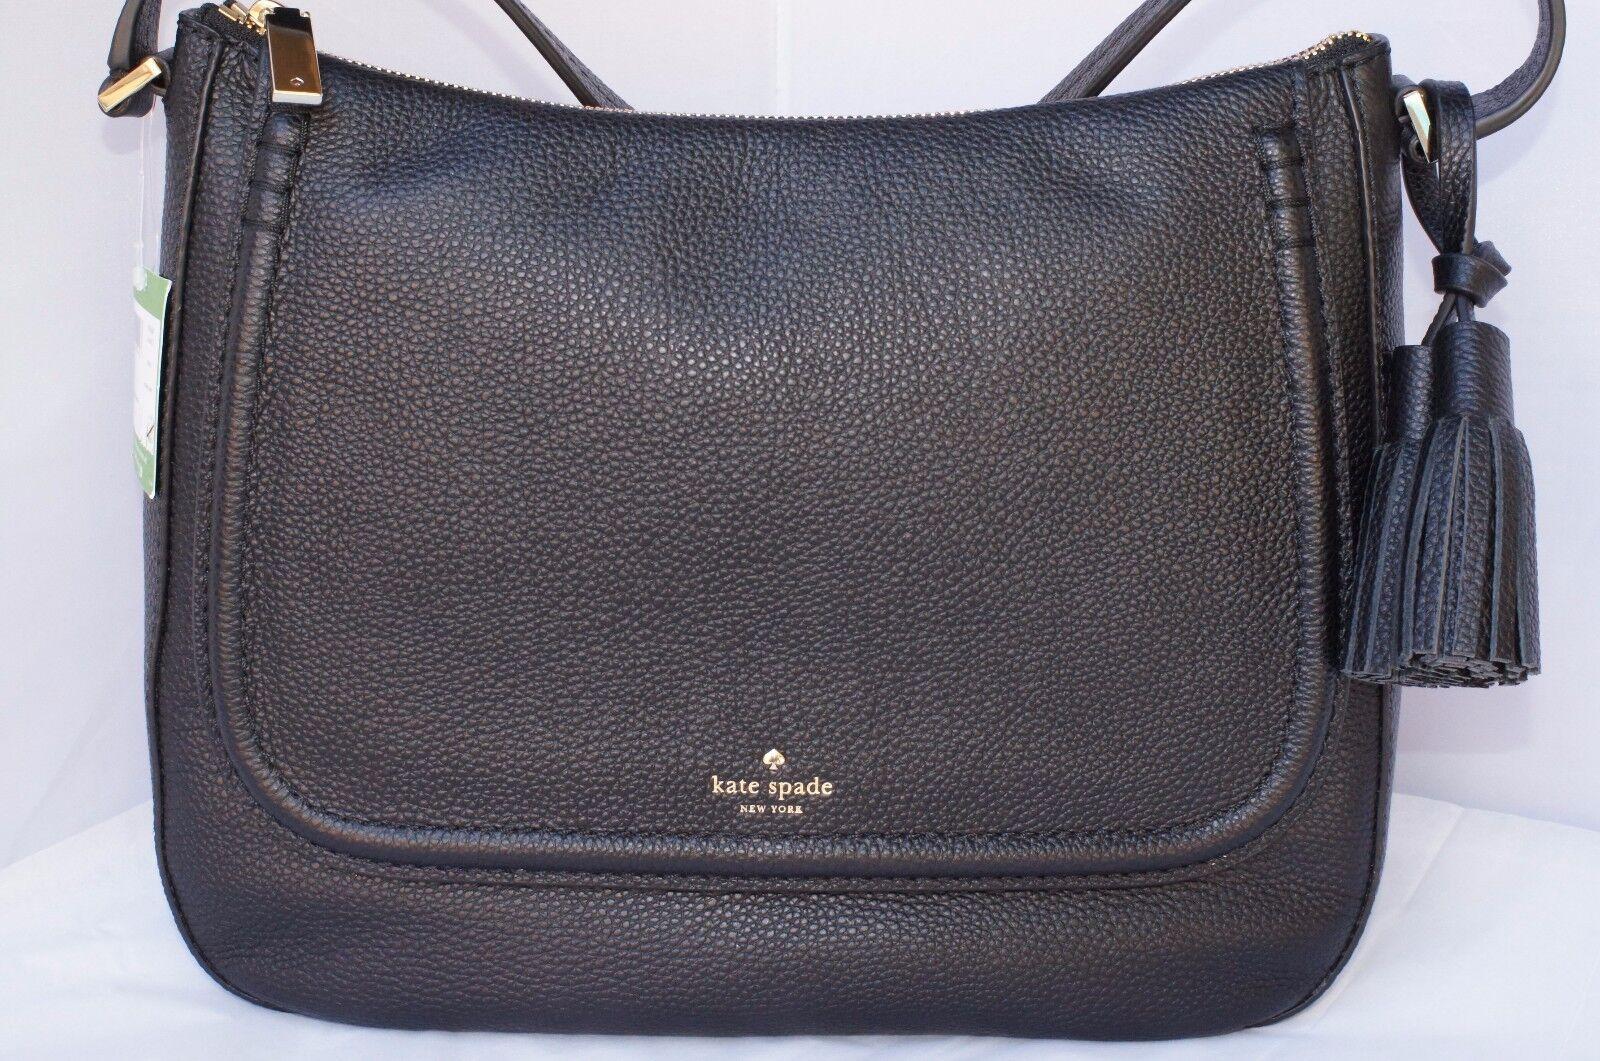 Kate Spade Orchard Street Leather Treana Hobo Shoulder Bag Black Pxru6847